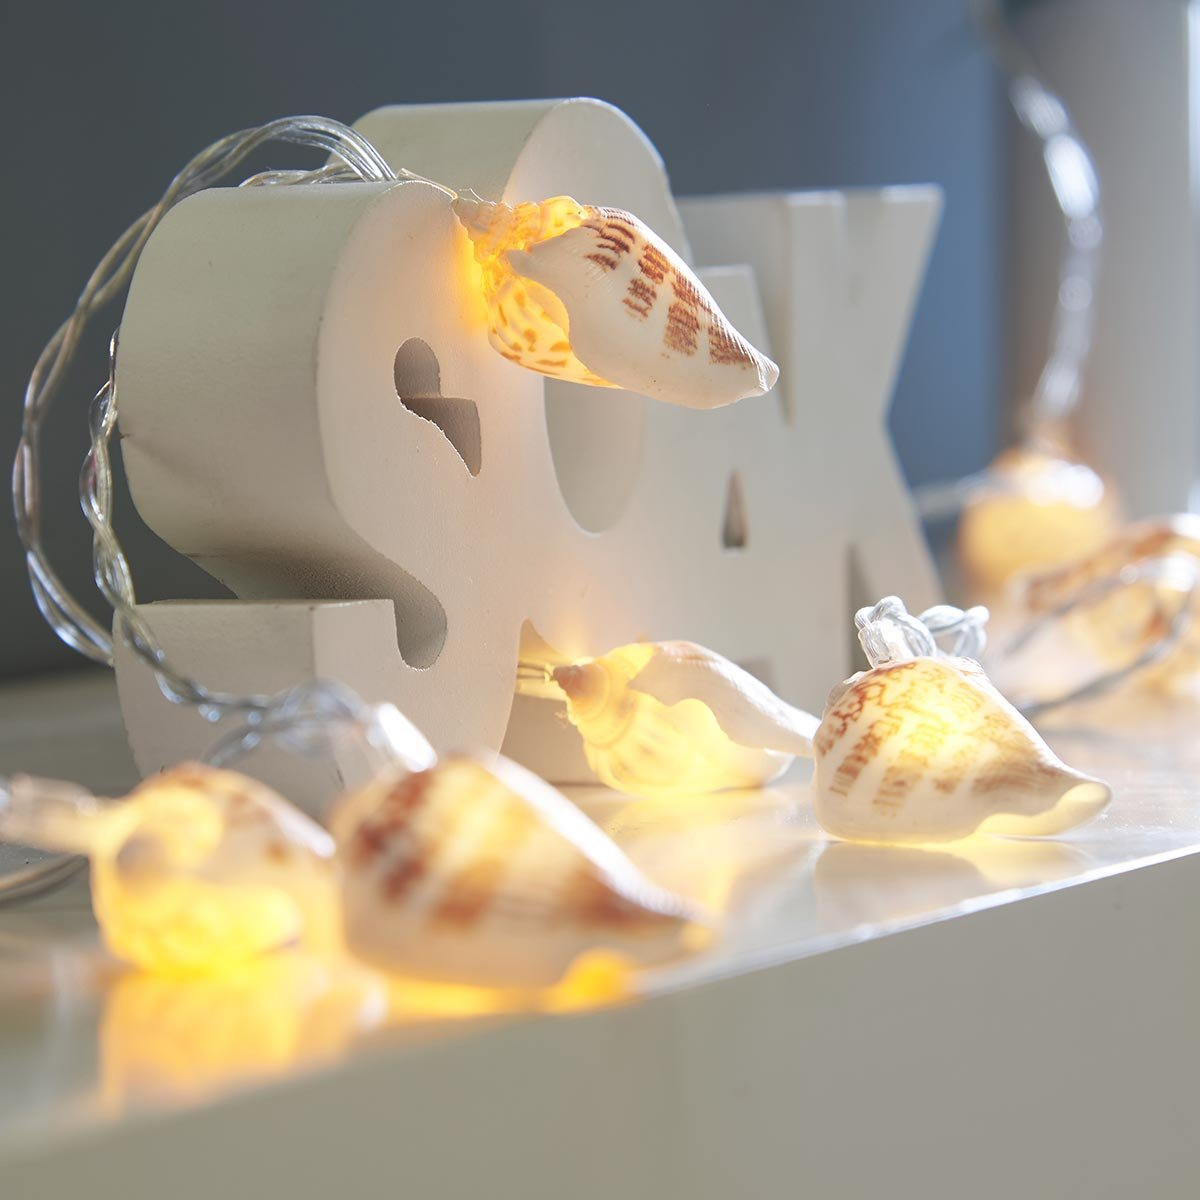 Festive Lights Sea Shell Fairy Lights - Battery Operated - 10 Warm White LEDs - Real Shells - Timer